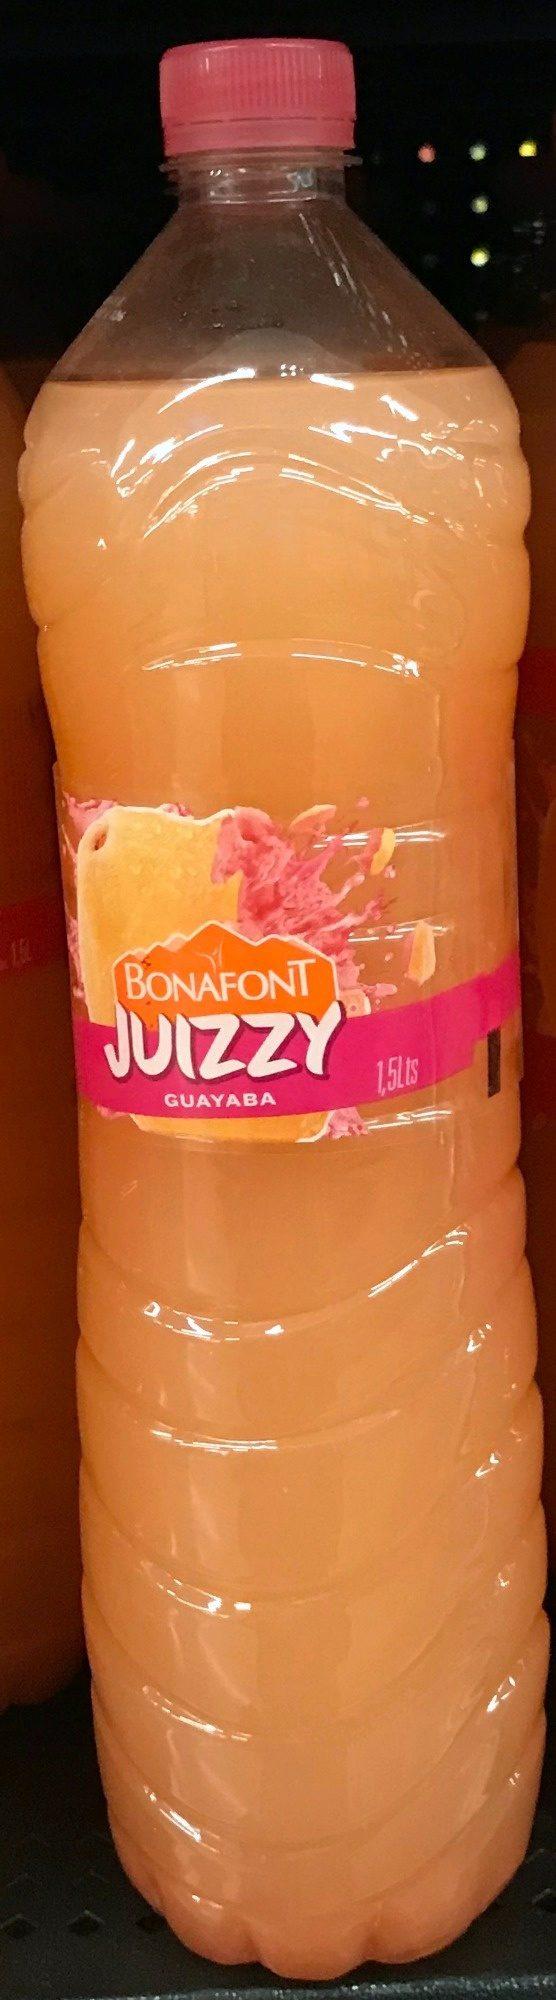 Bonafont Juizzy sabor Guayaba - Producto - es